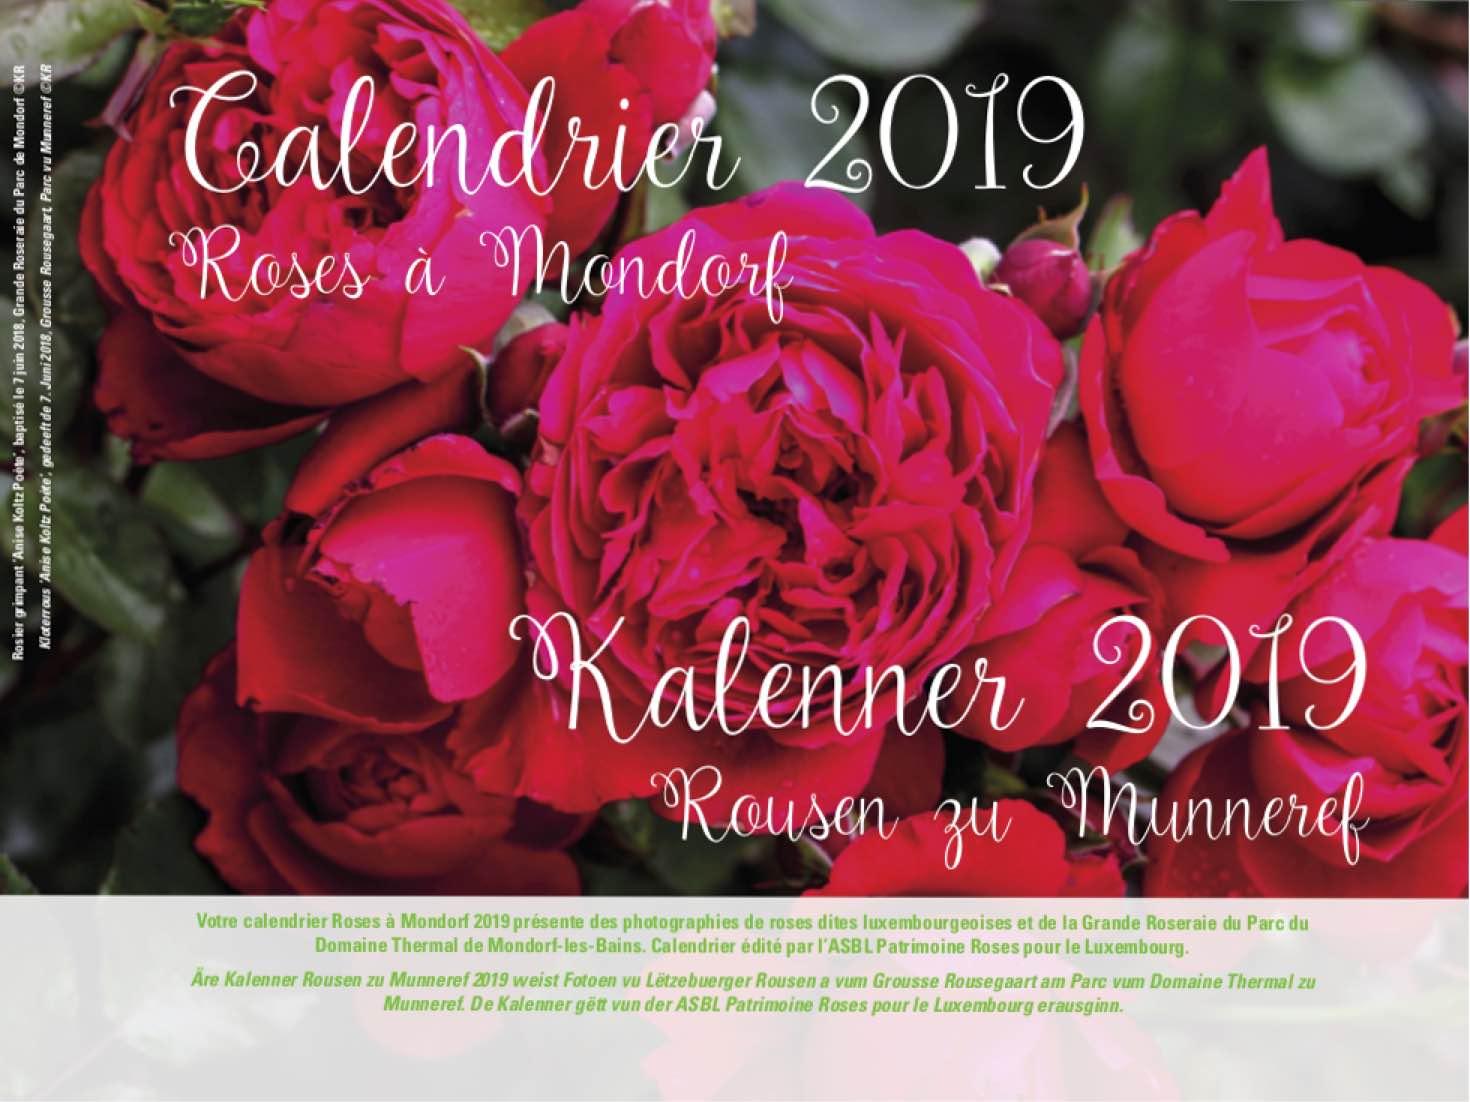 Achat Calendrier 2019.Acheter Le Calendrier 2019 Rousen Zu Munneref Patrimoine